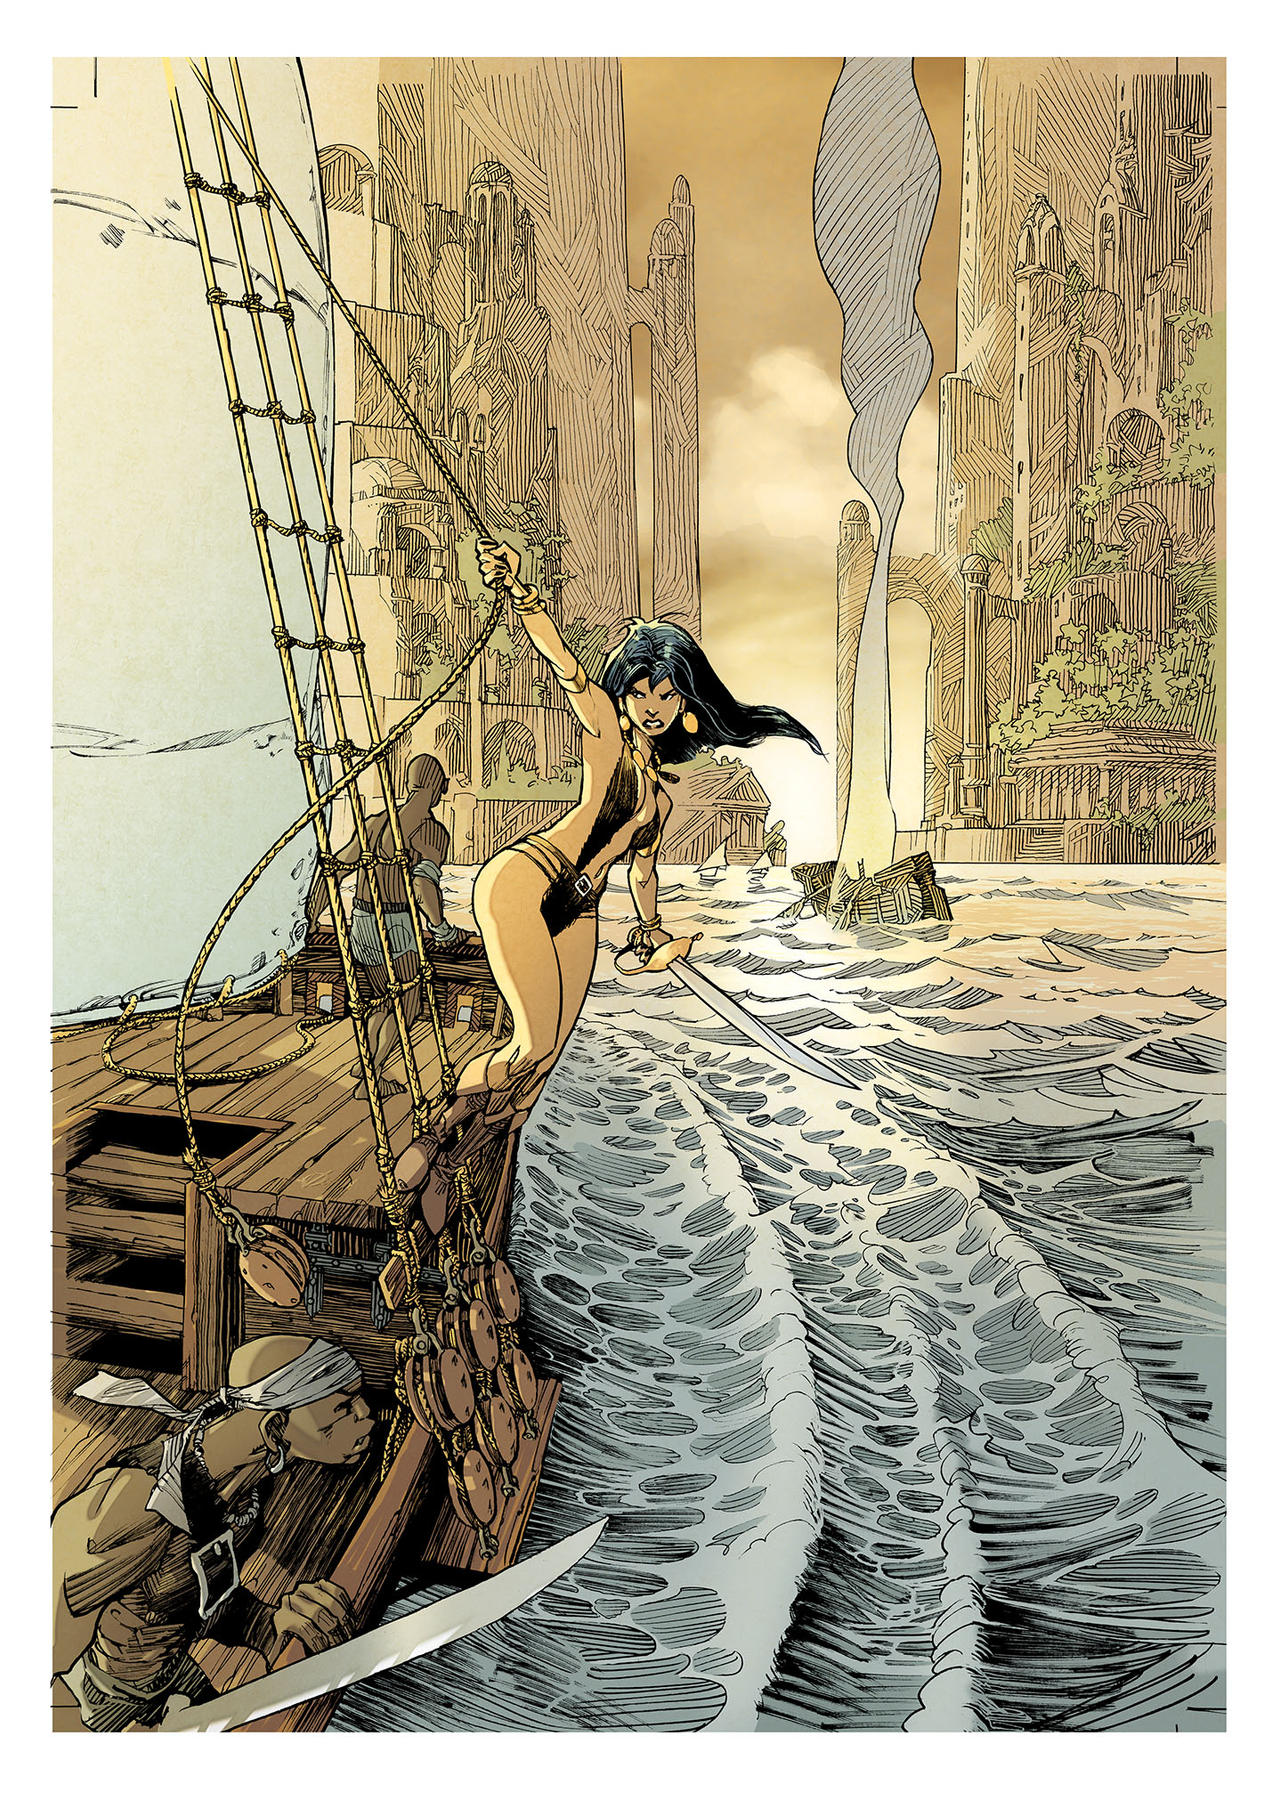 Age of Conan -Belit